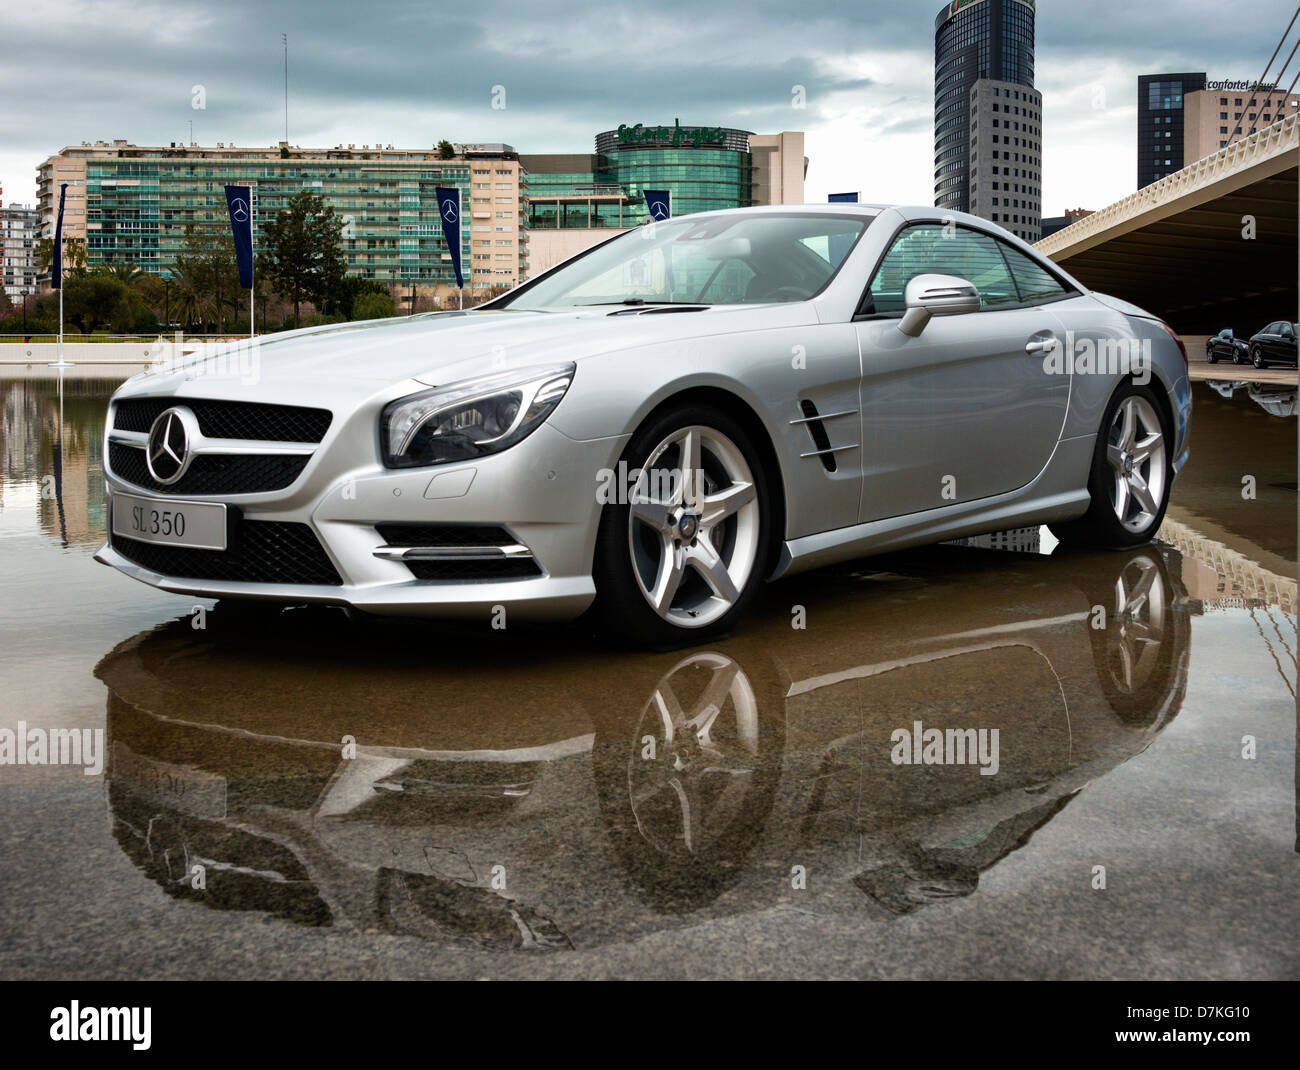 Mercedes-Benz SL350 - Stock Image